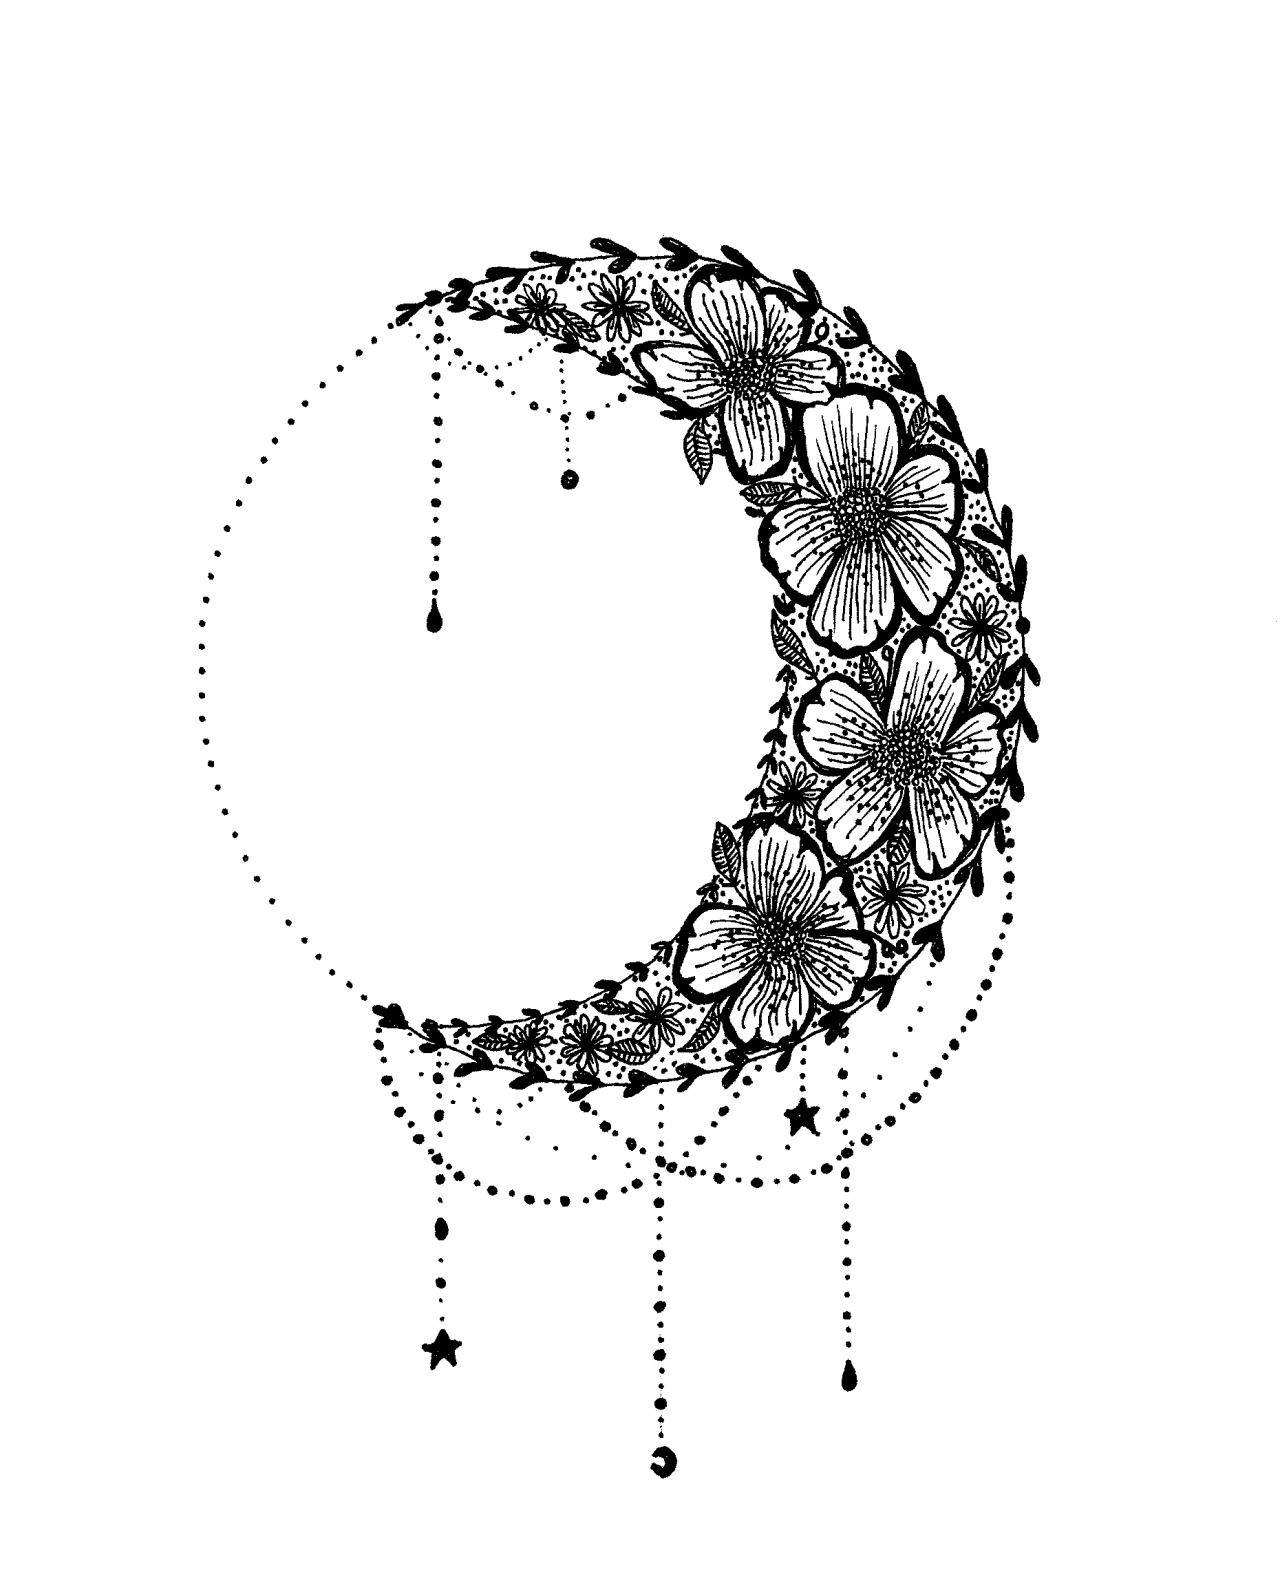 Floral Crescent Moon design | tattoo ideas | Flower ...  Floral Crescent...